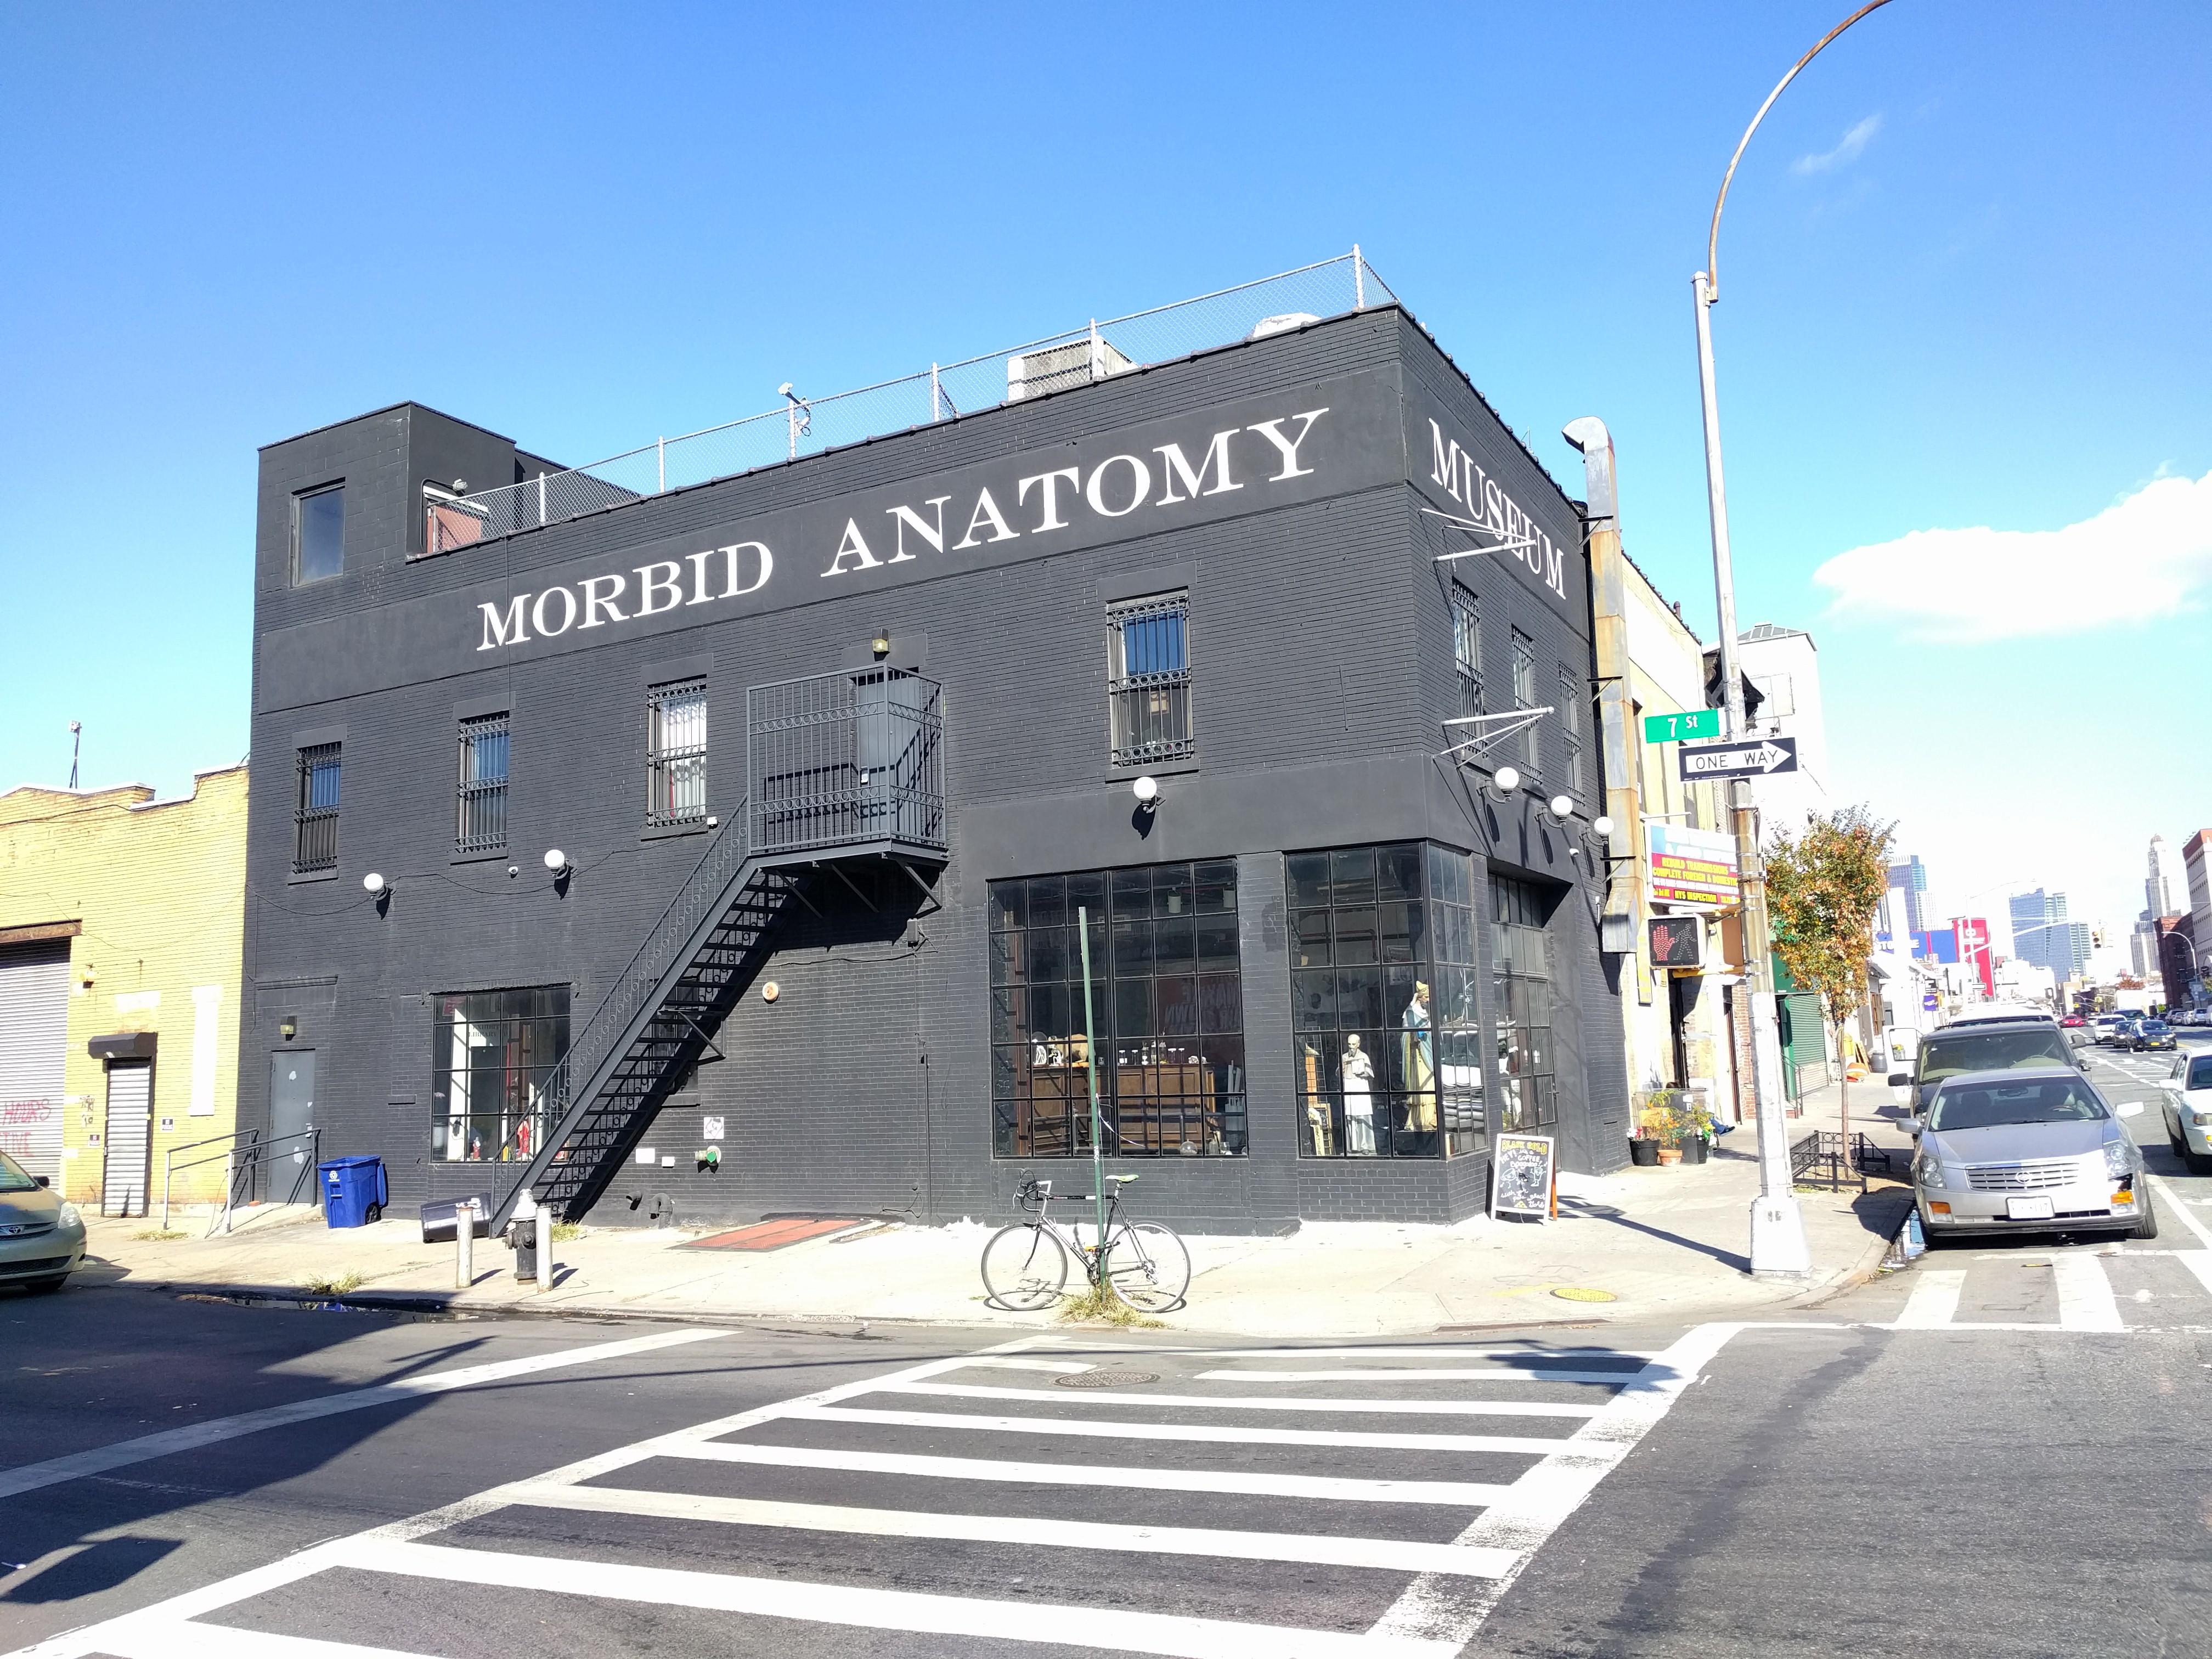 File:Morbid Anatomy Museum jeh.jpg - Wikimedia Commons